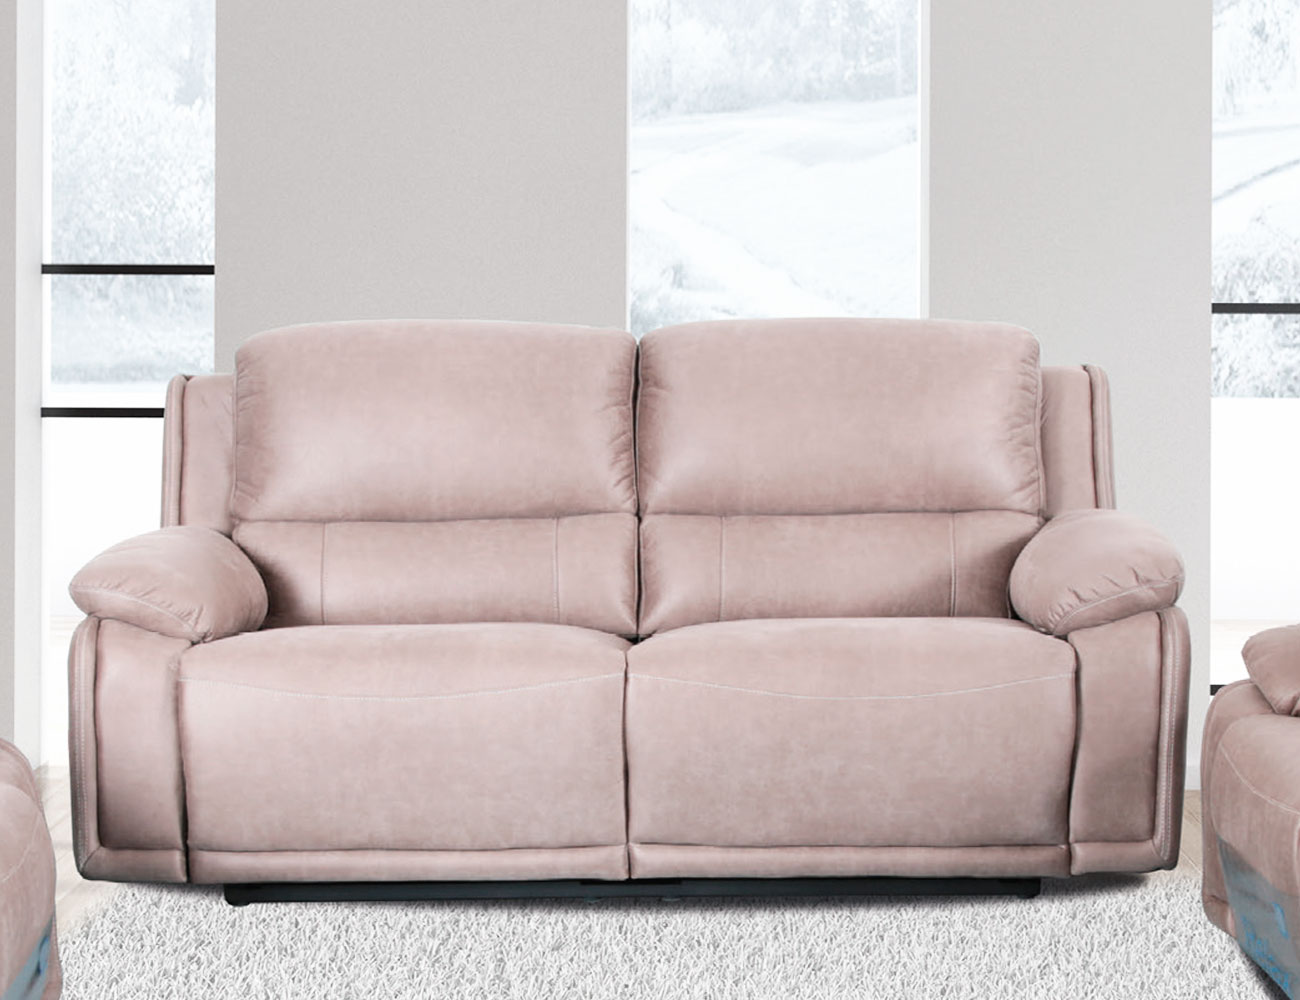 Sofa 3 plazas 2 asientos relax arena